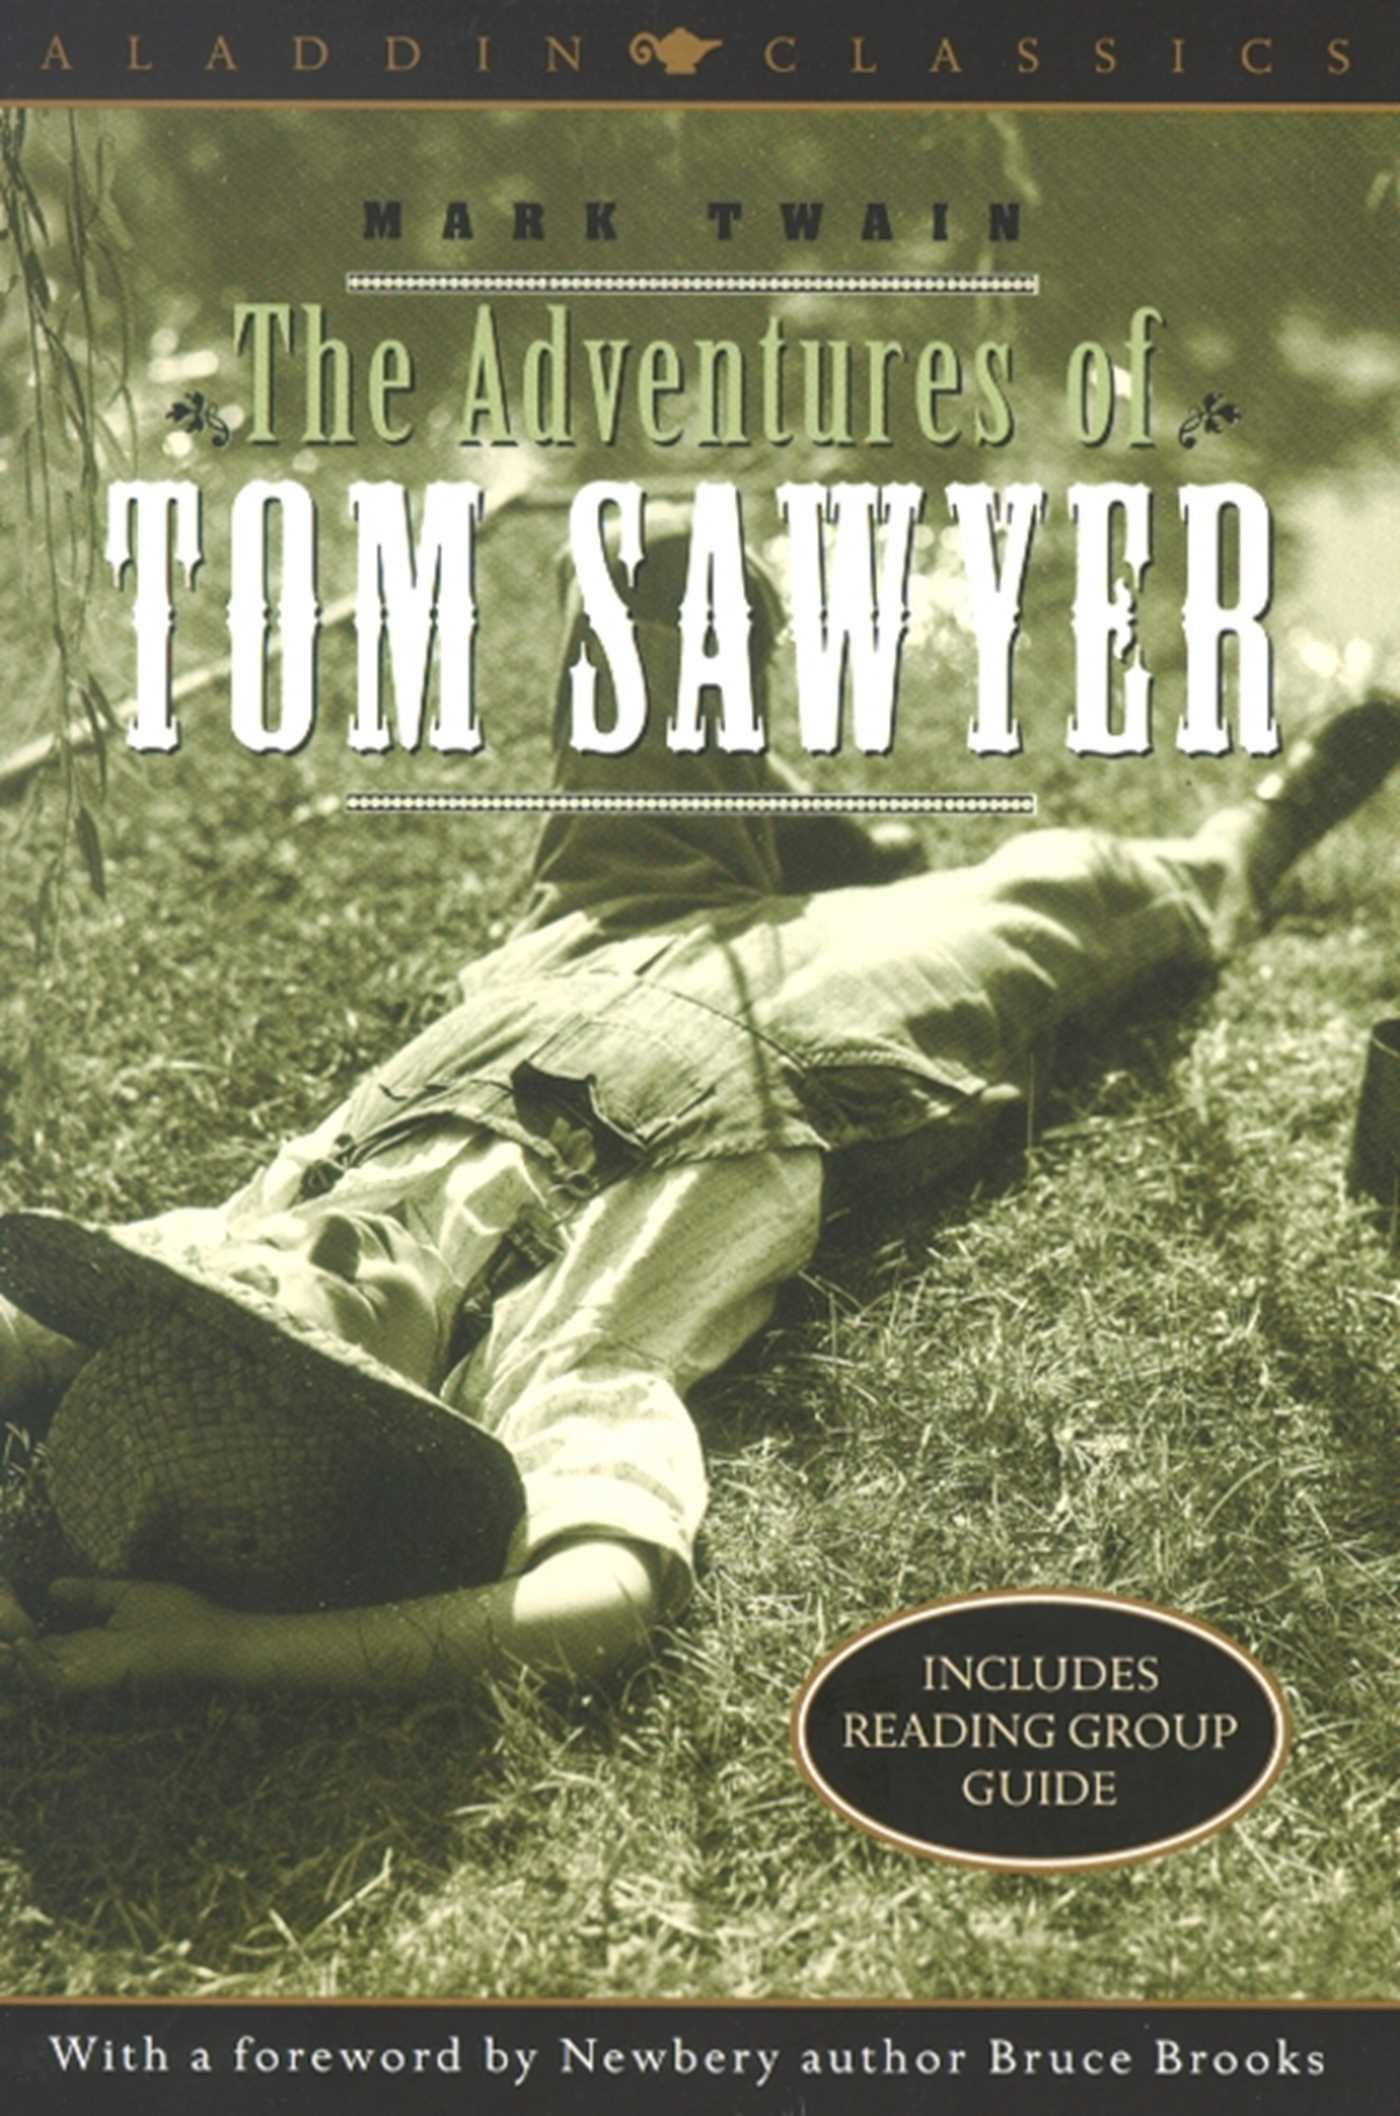 Adventures of tom sawyer 9781442457492 hr